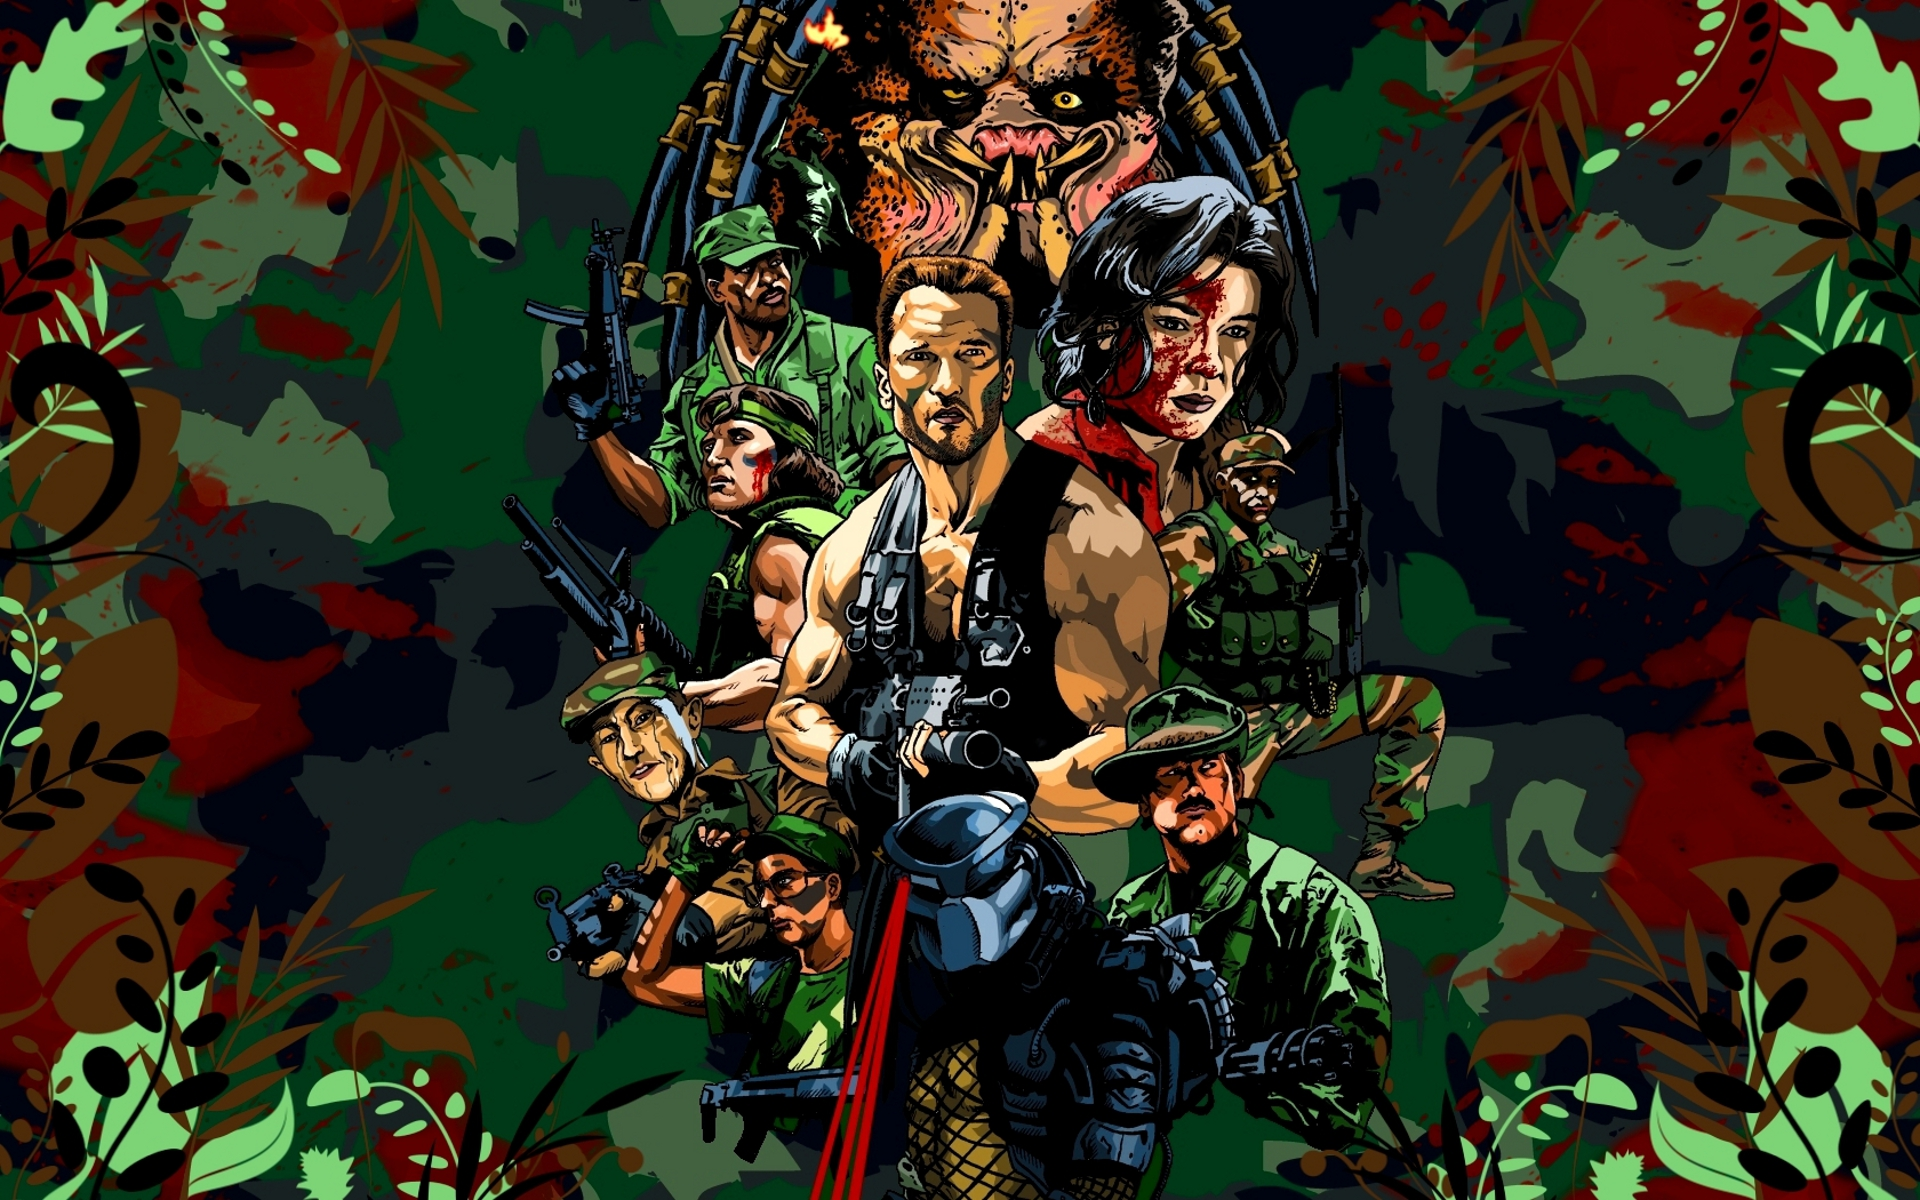 Predator HD Wallpaper Background Image 1920x1200 ID281321 1920x1200